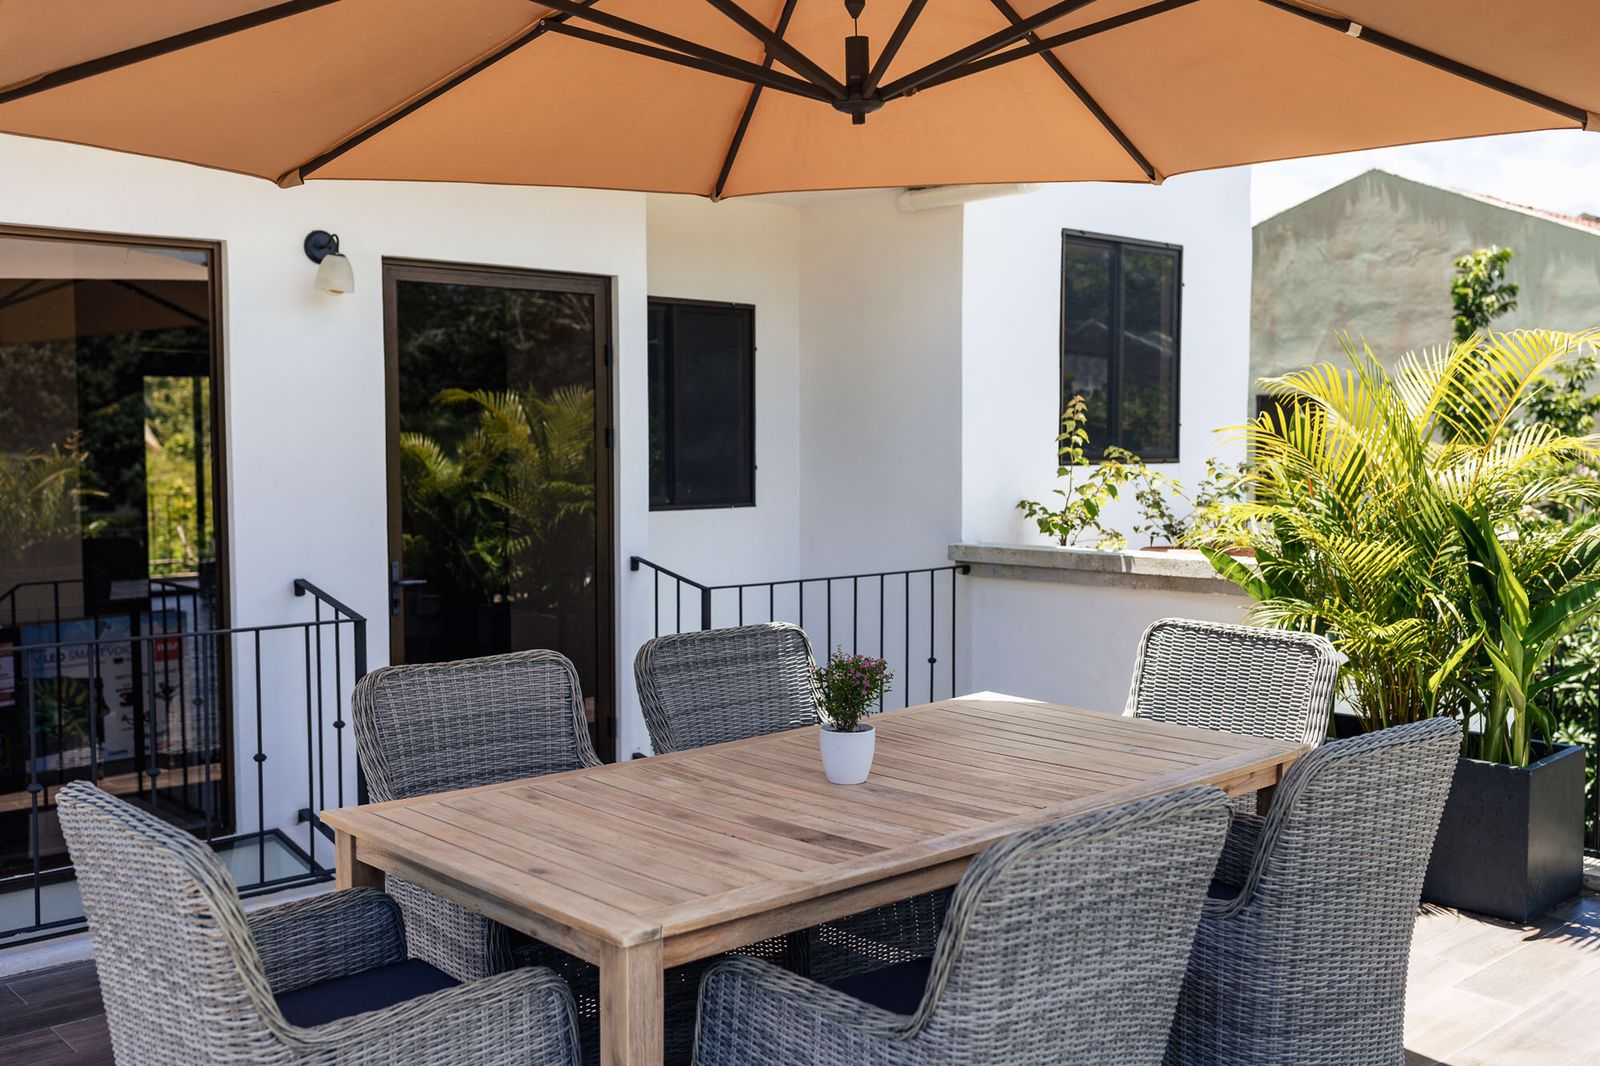 modern design patio with umbrella for comfort